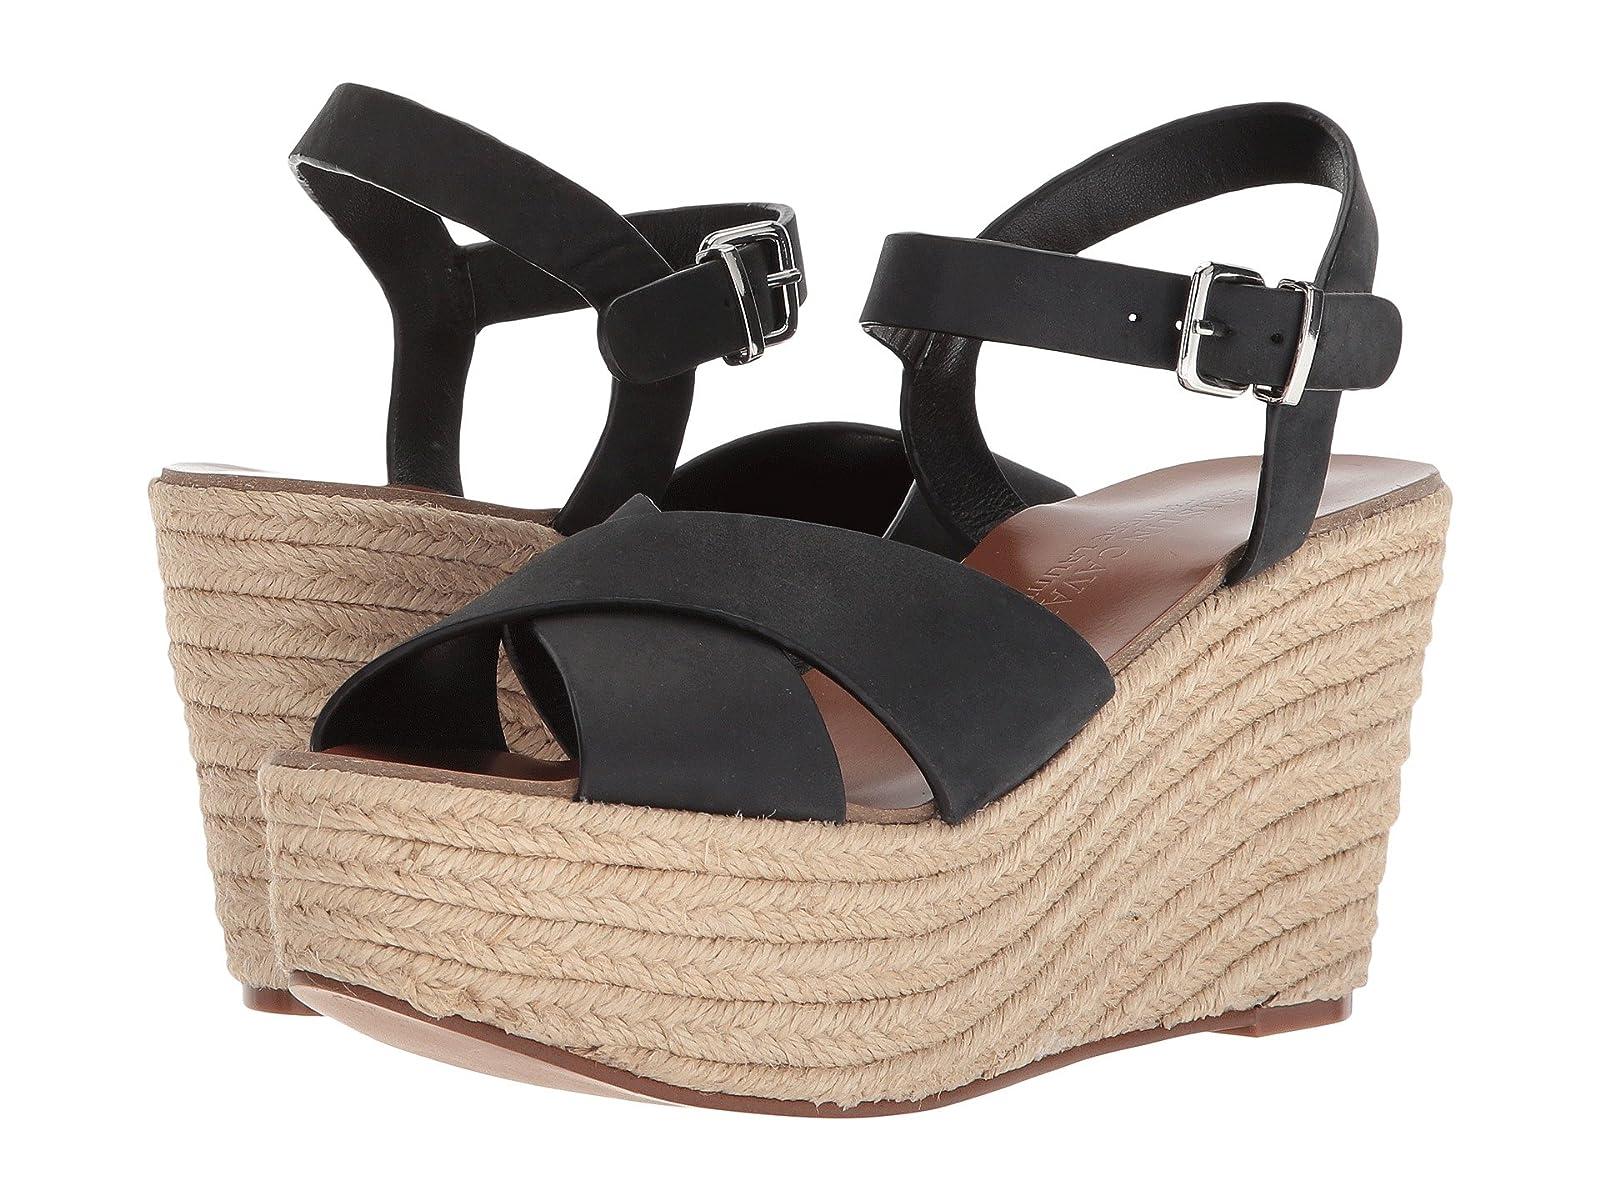 Kristin Cavallari Mikah Espadrille WedgeAtmospheric grades have affordable shoes